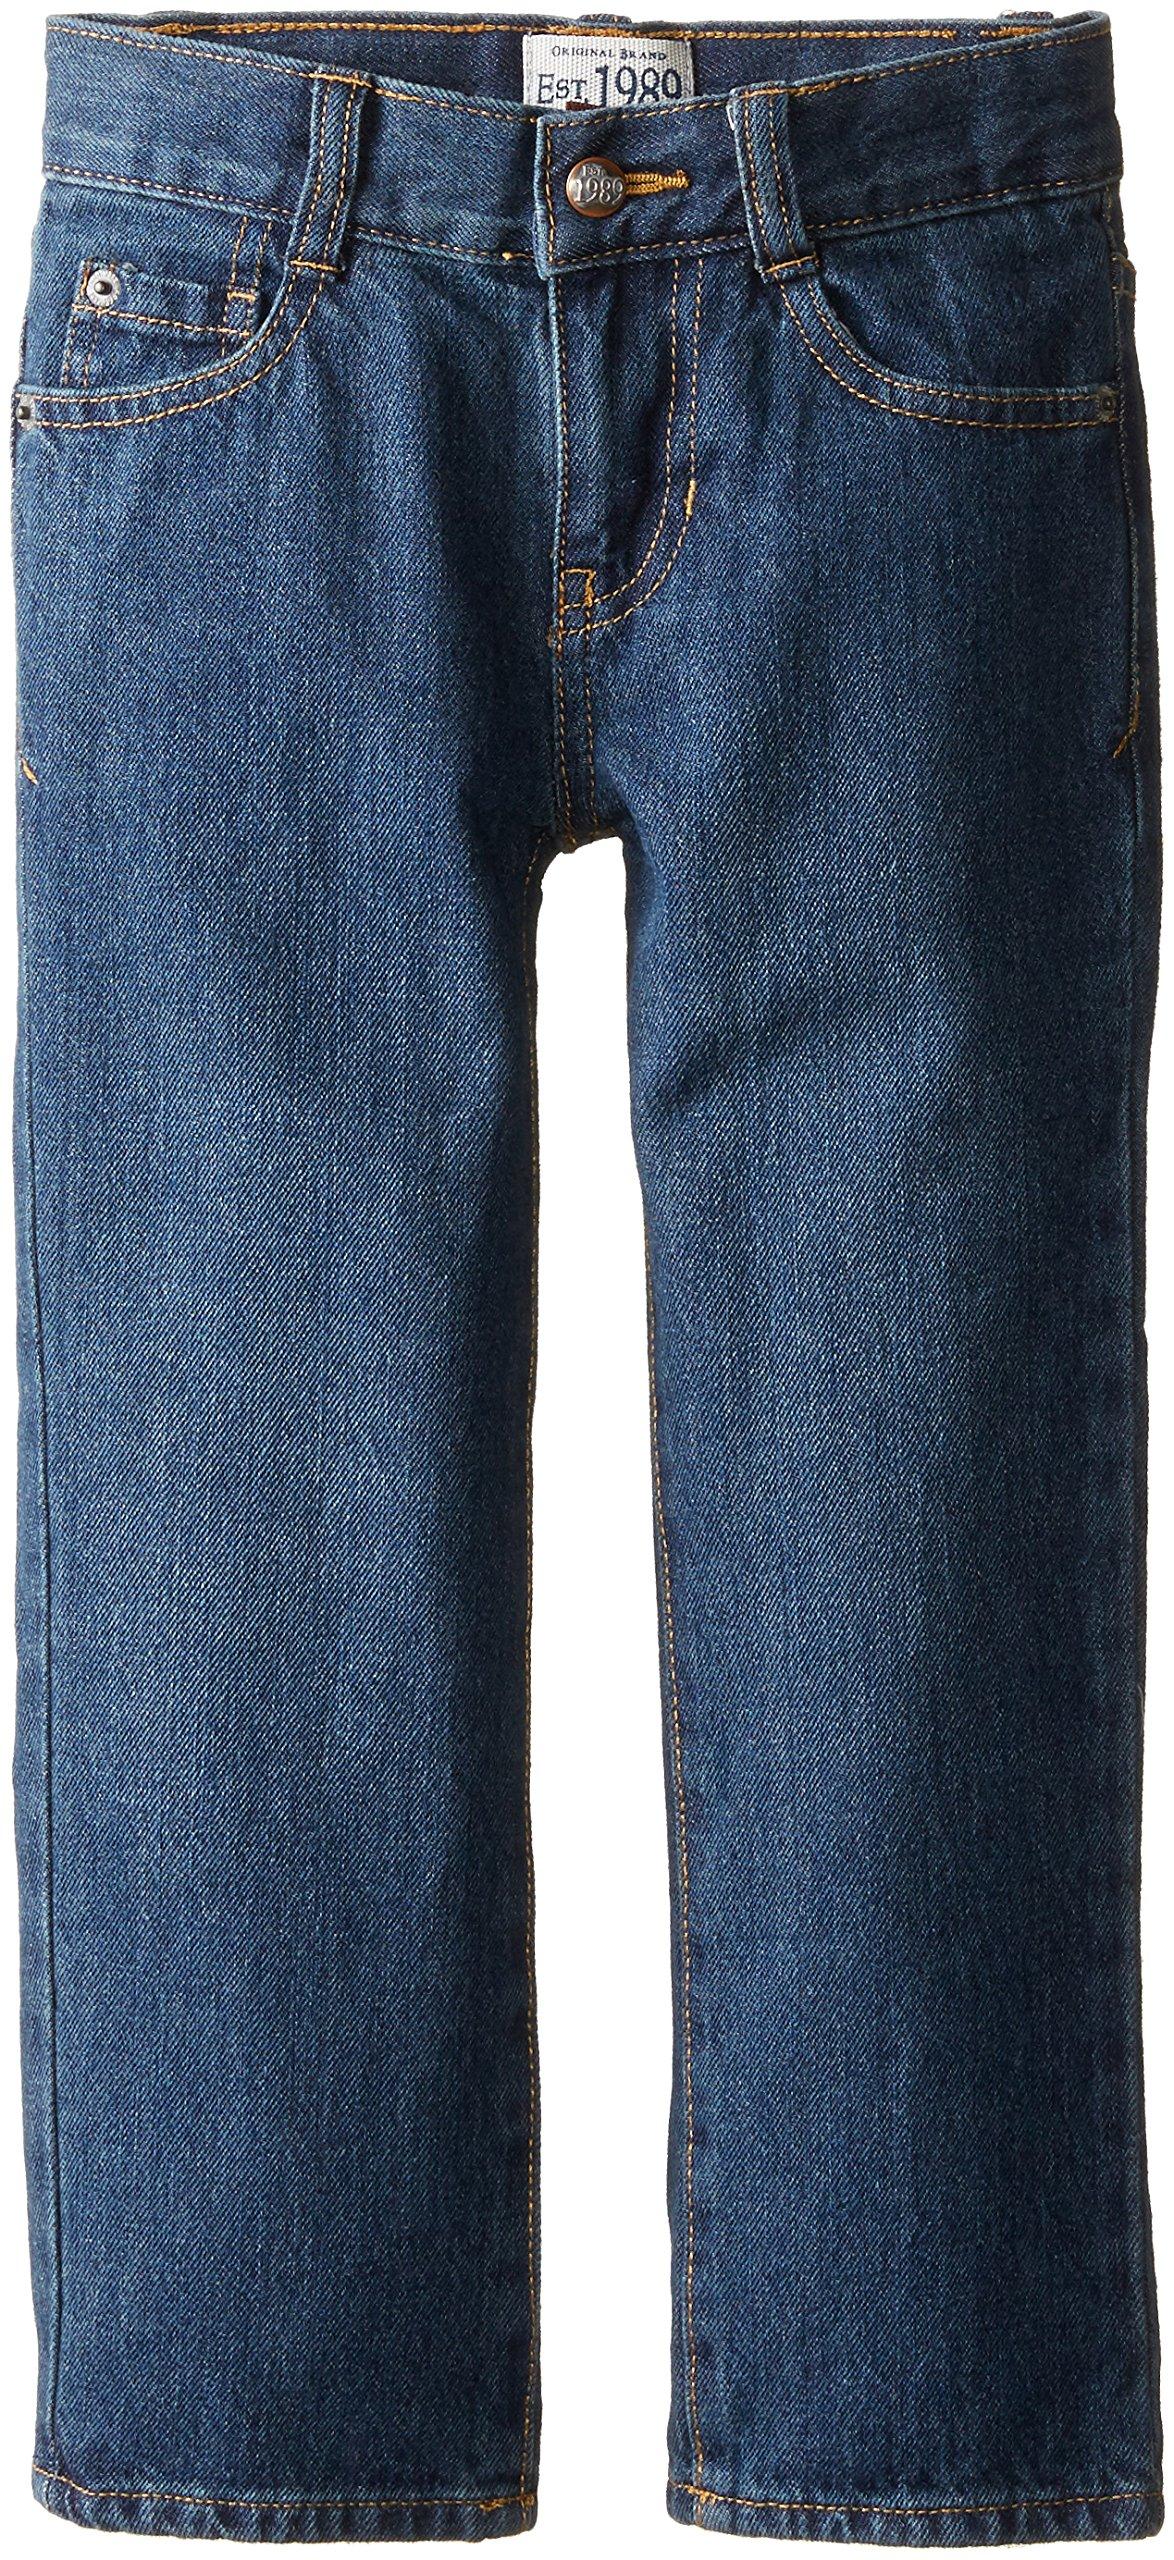 The Children's Place Little Boys' Straight Leg Jeans, Solstice, 4